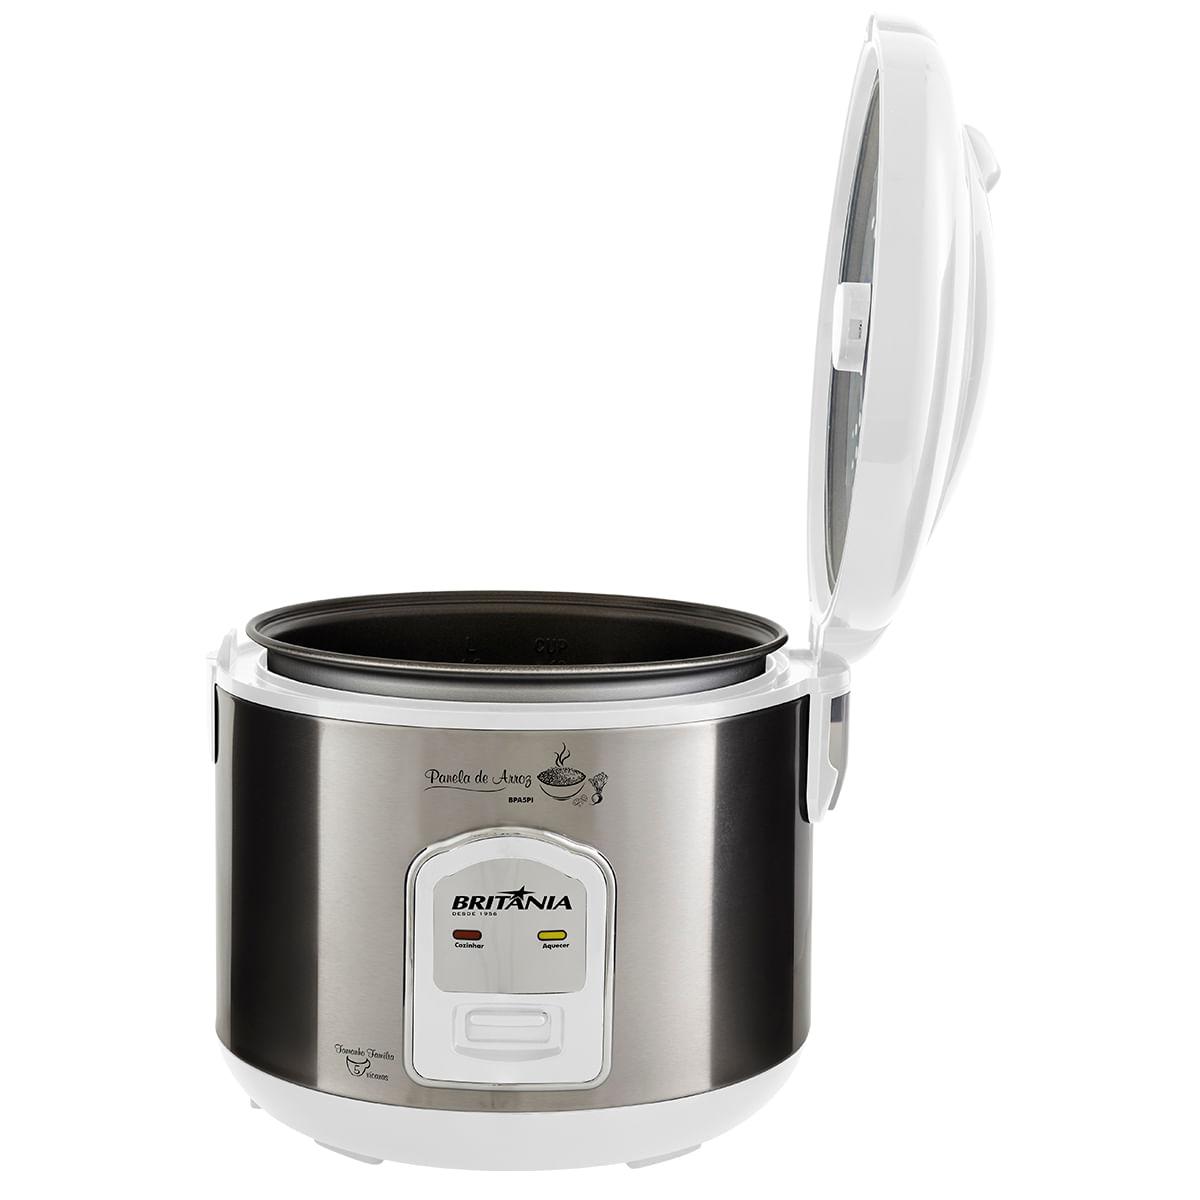 Panela de Arroz BPA5BI 5 xícaras - Britânia